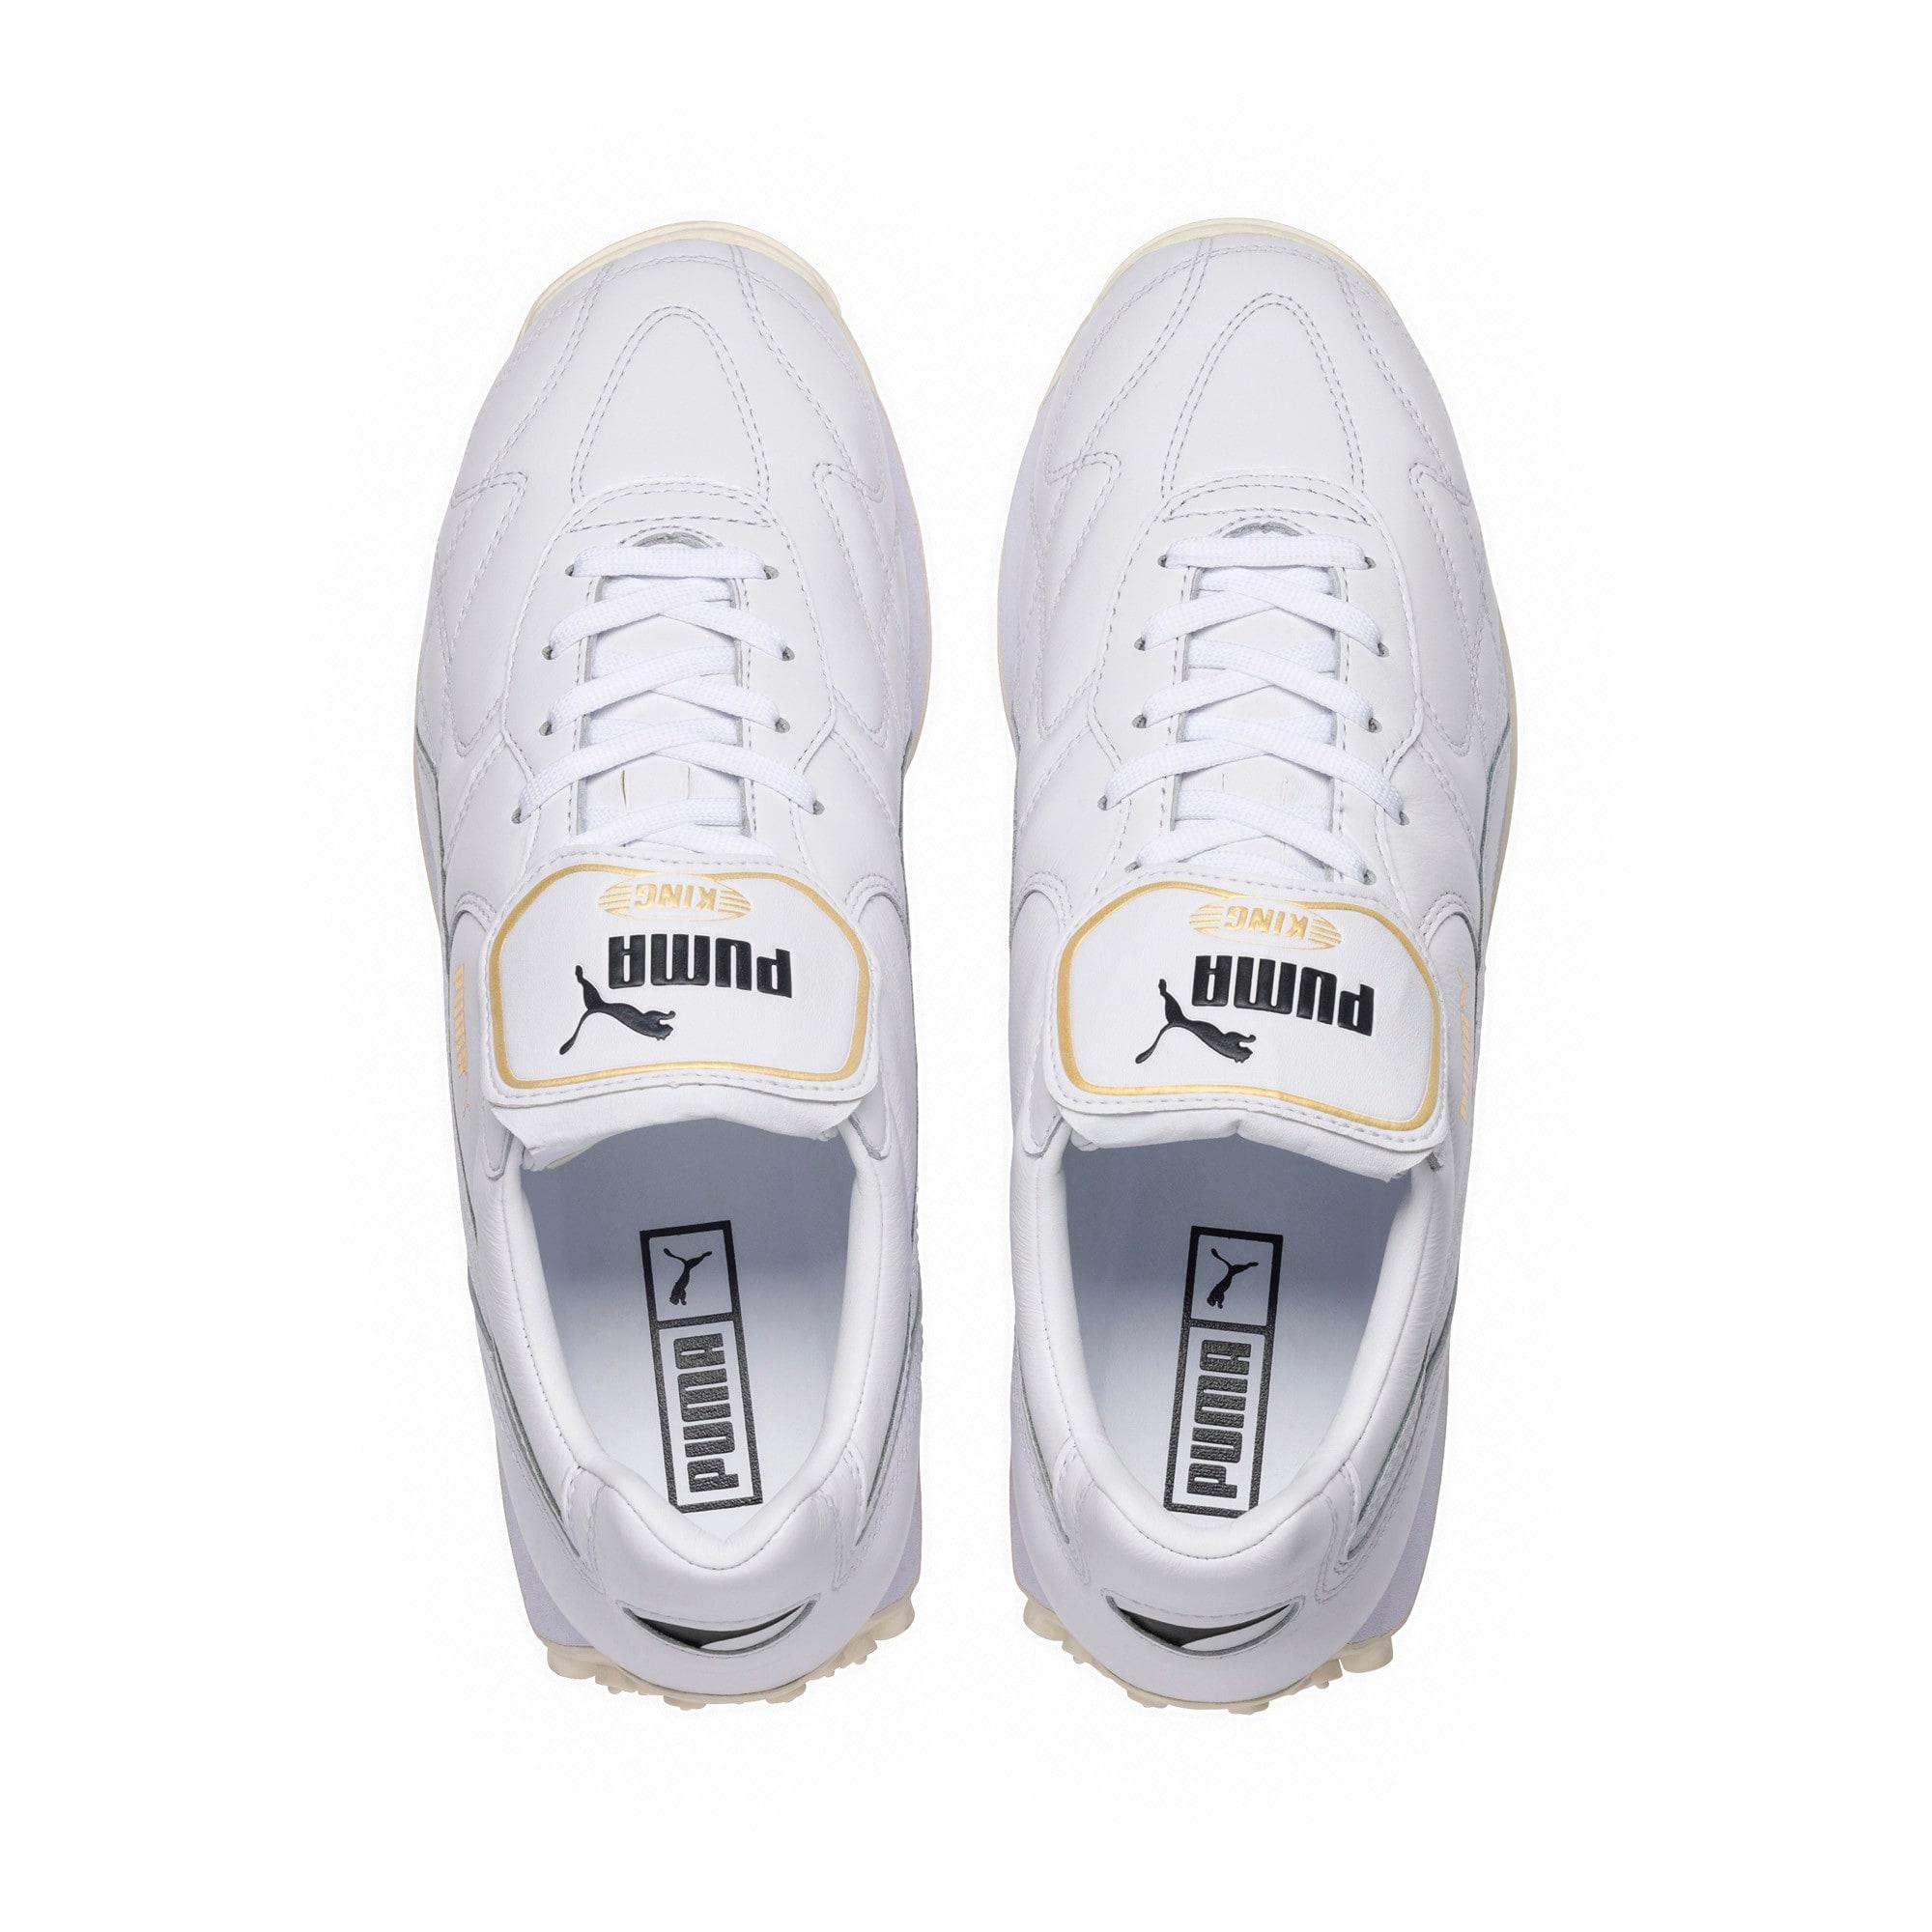 Thumbnail 5 of King Avanti Premium Sneakers, Puma White-Puma Team, medium